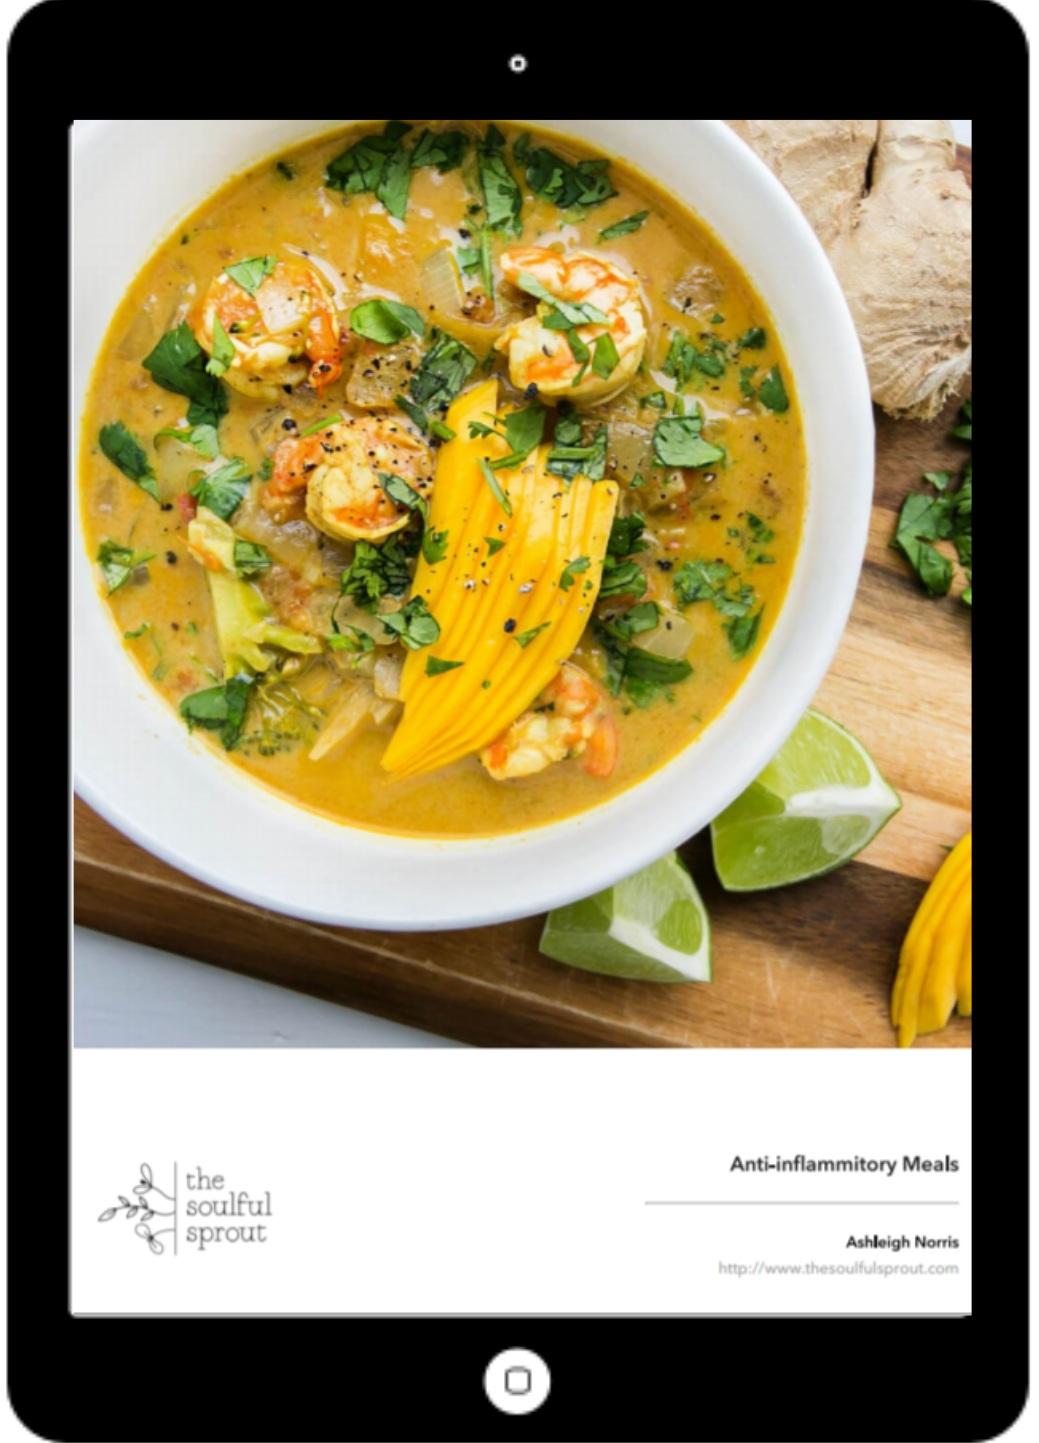 Holistic+Nutrition+meal+plans+Toronto